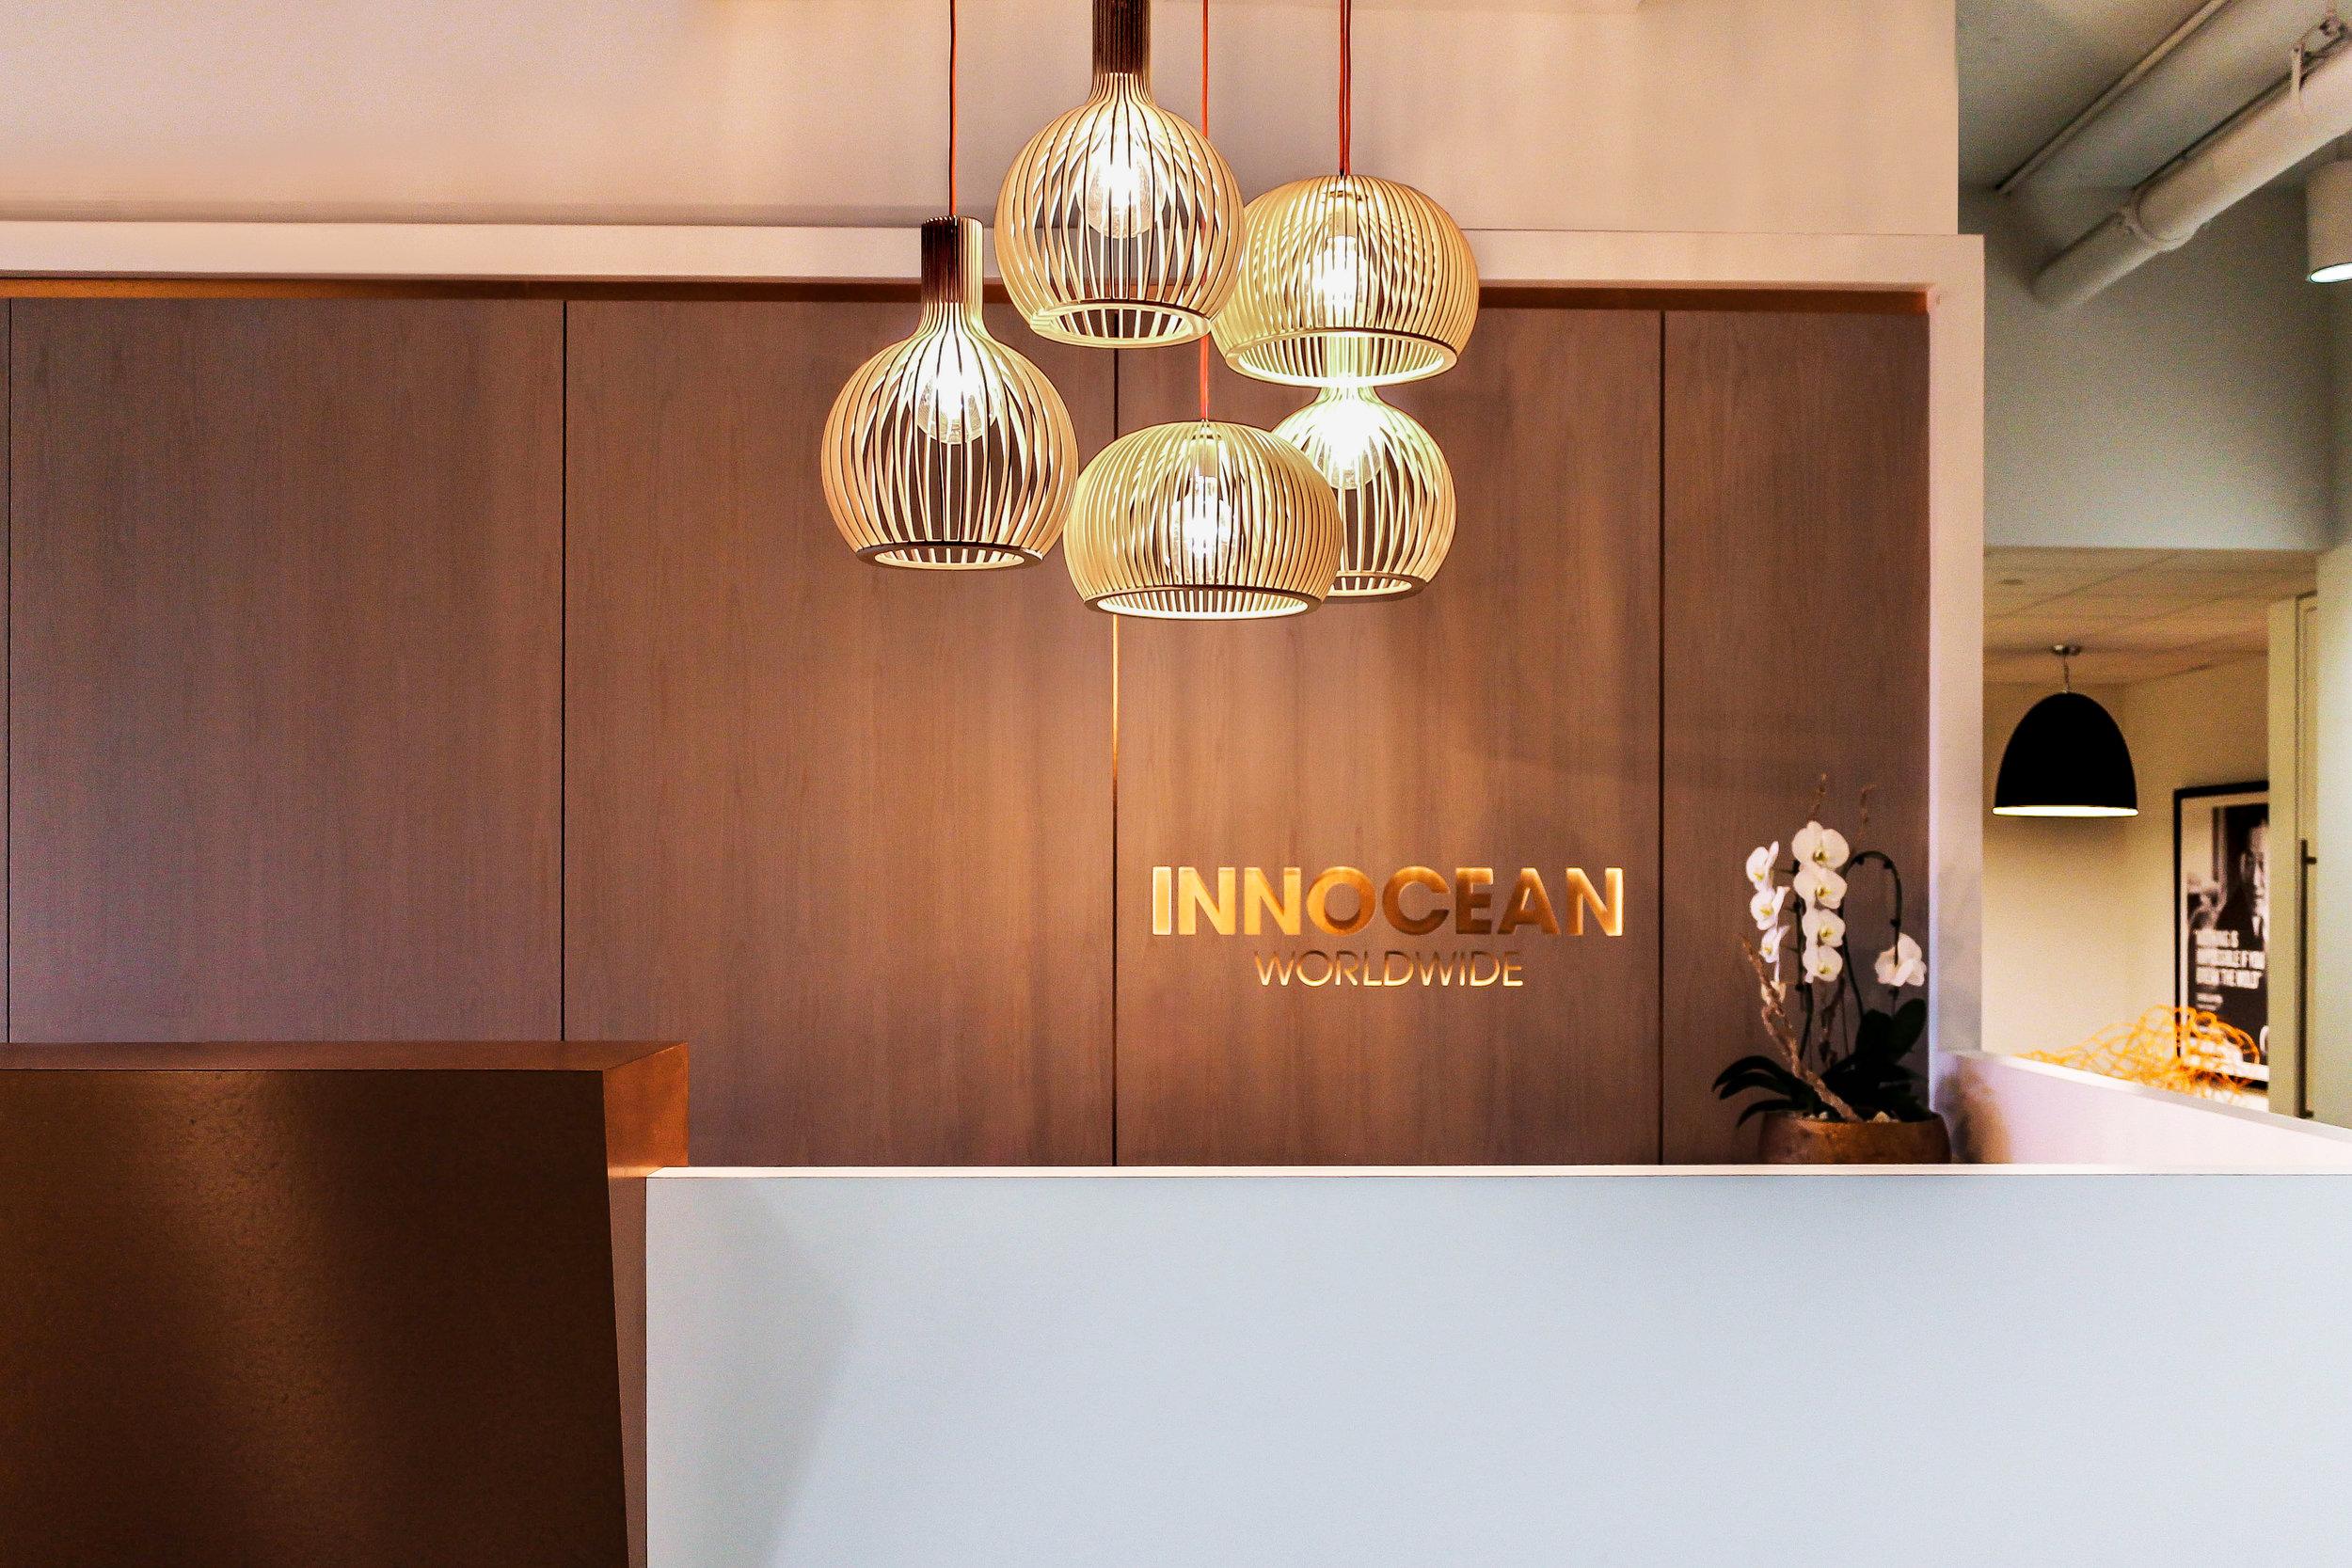 Innocean Worldwide